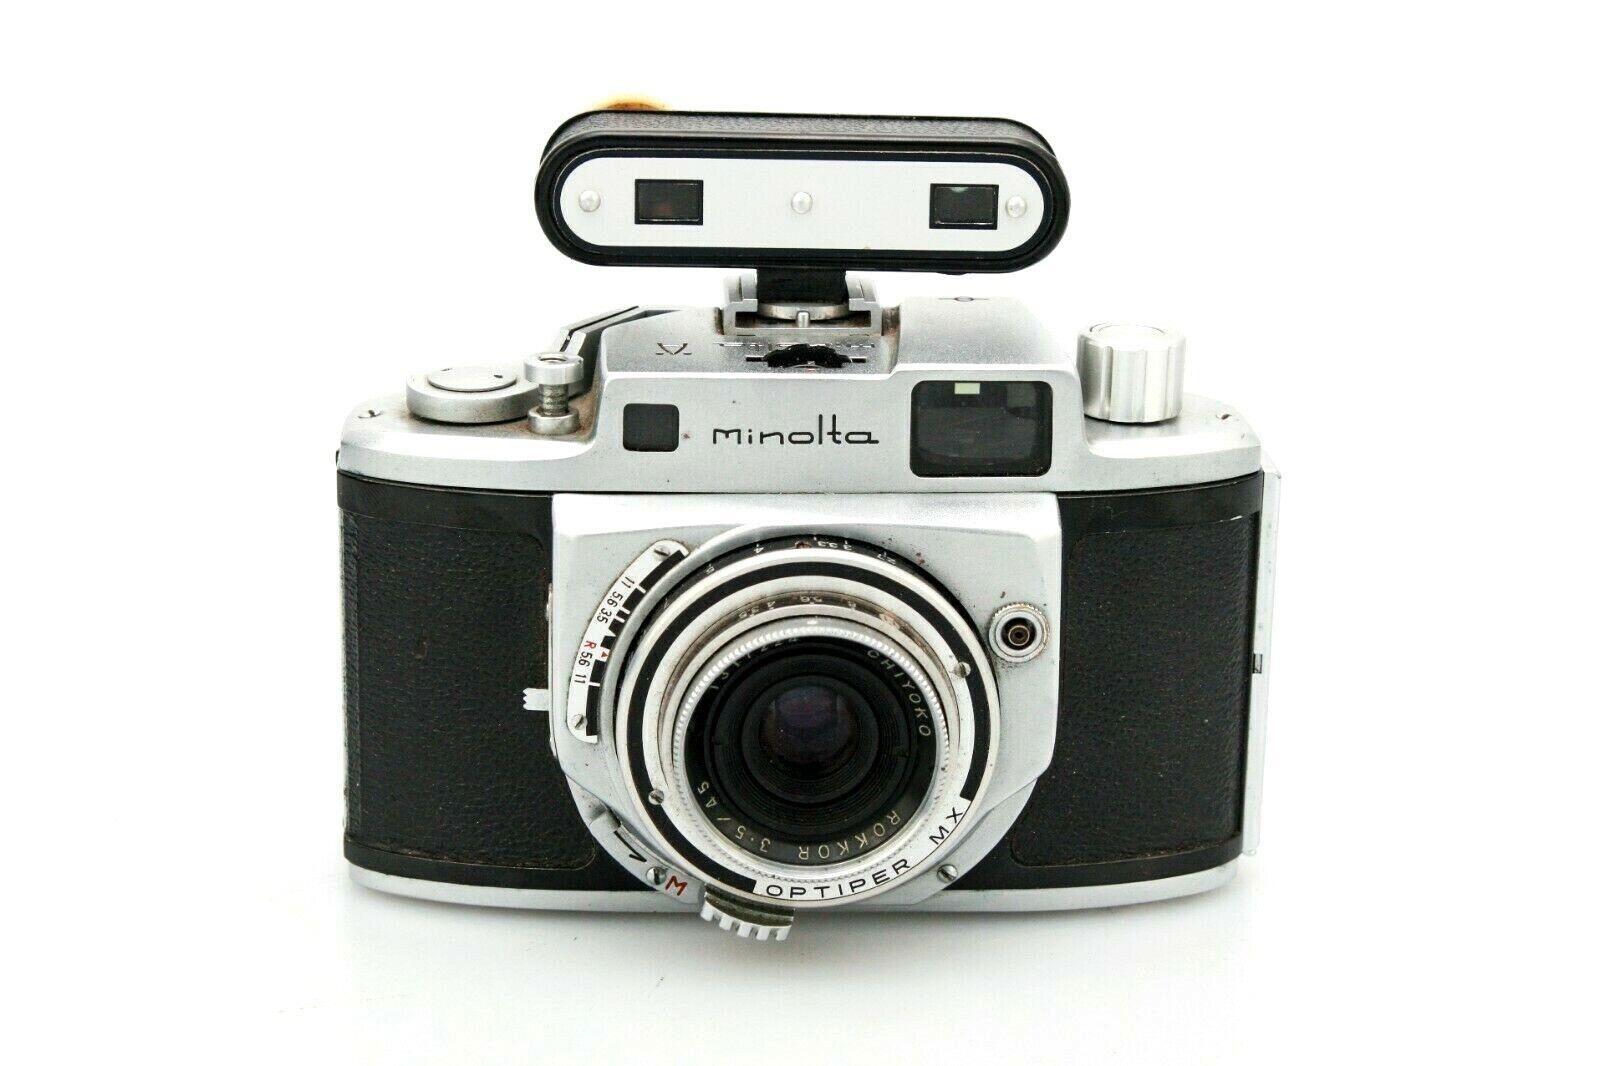 Vintage Pazisa Germany Shoe Mount Rangefinder - Clean Optics